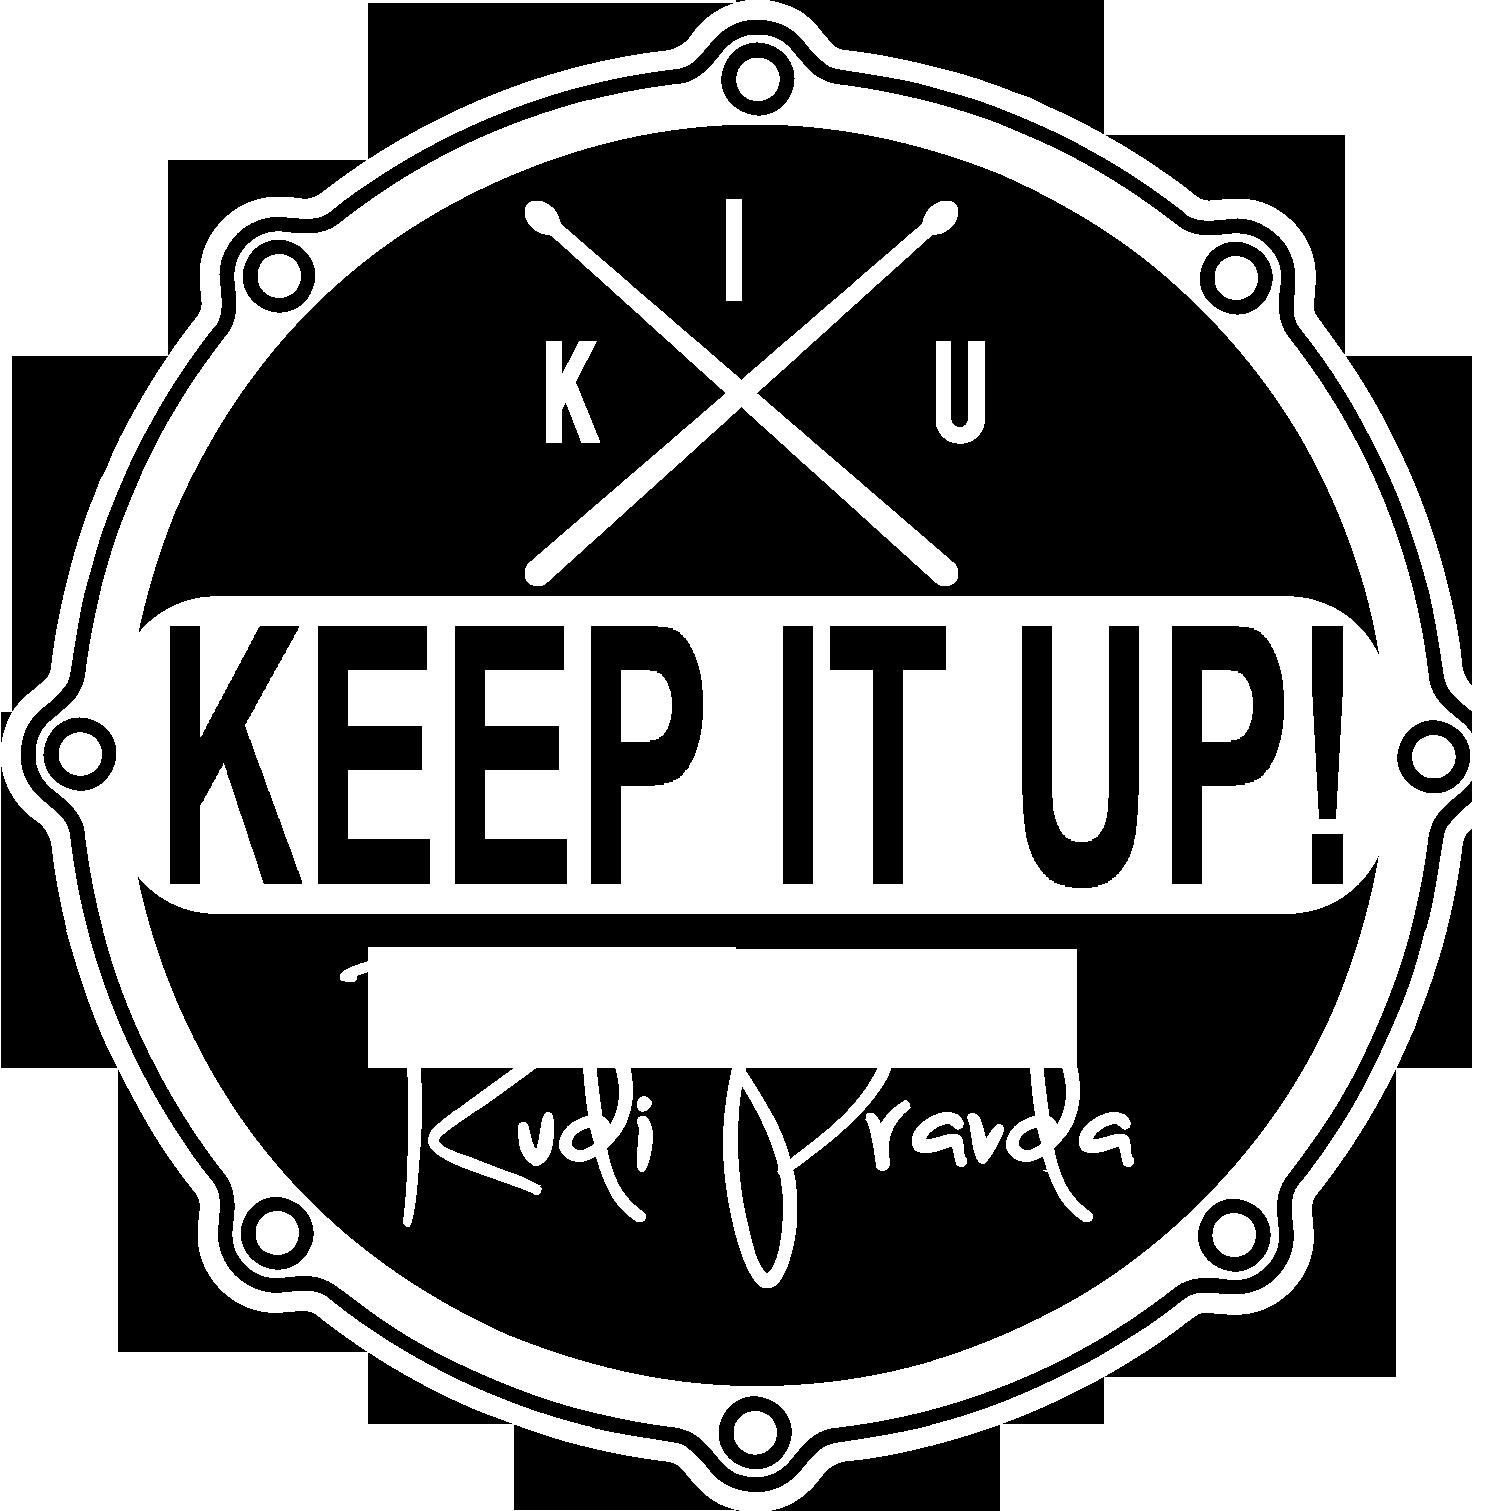 Keep It Up!